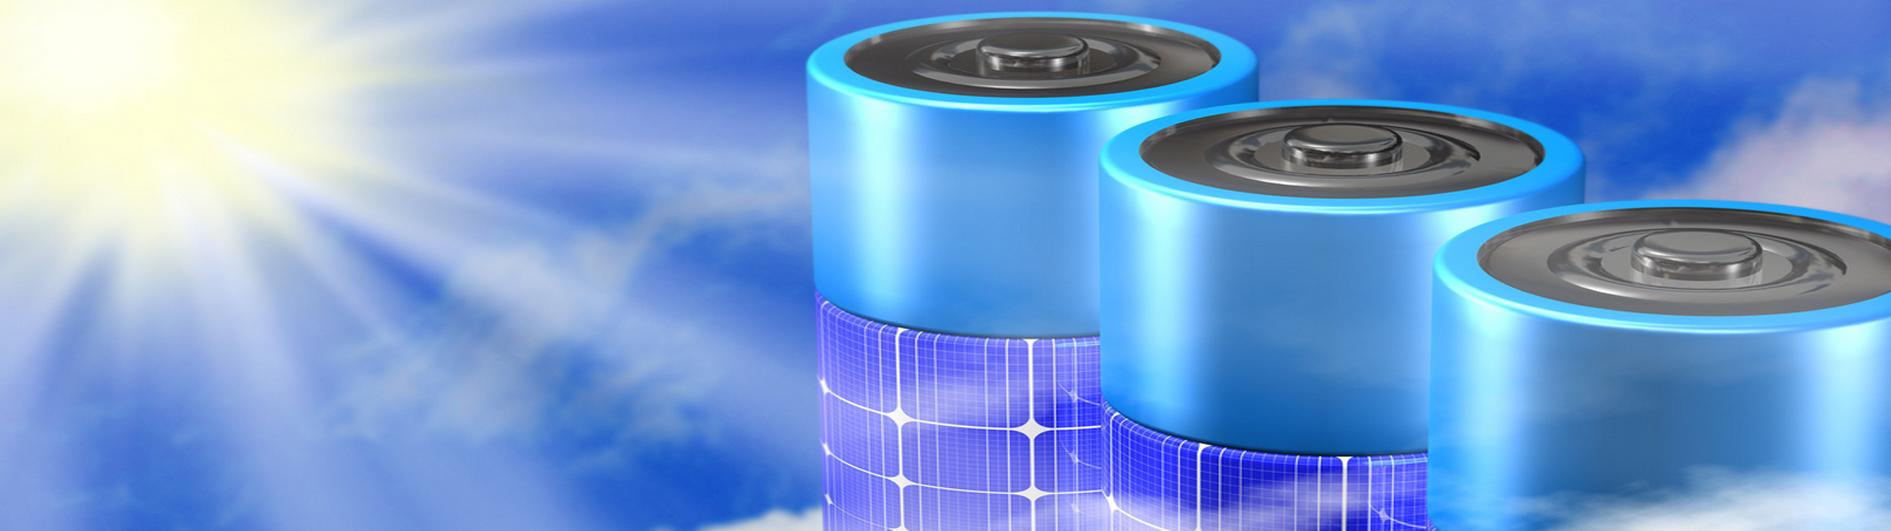 Solartechnik Photovoltarik Speichertechnik